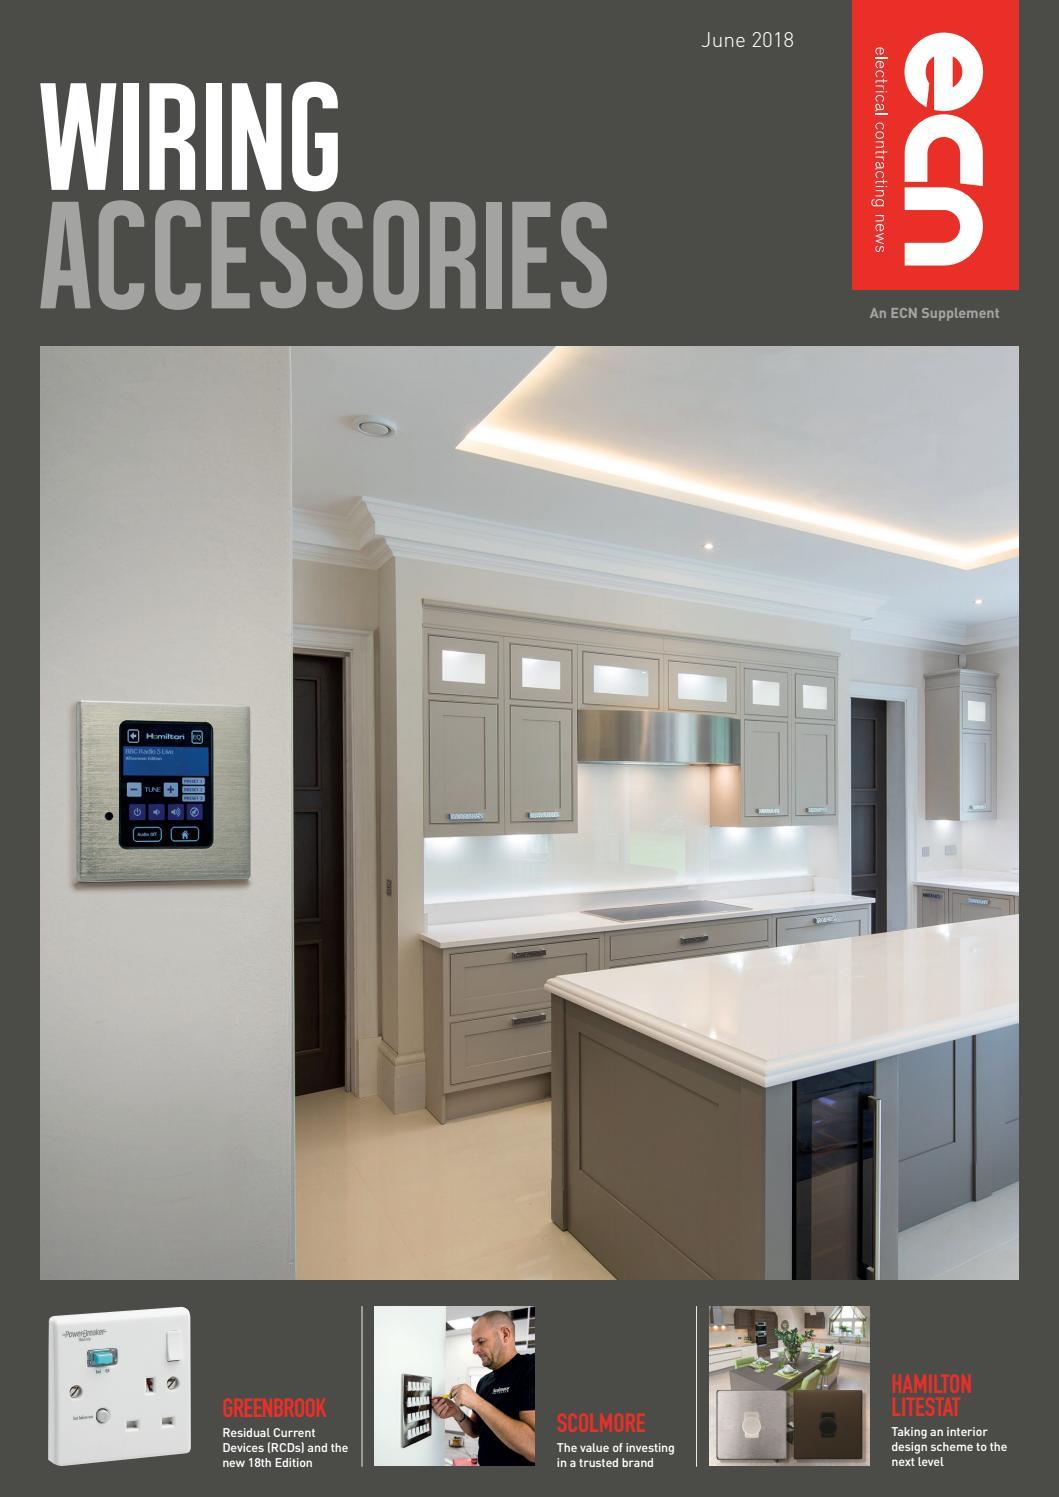 hight resolution of ecn wiring accessories supplement 2018